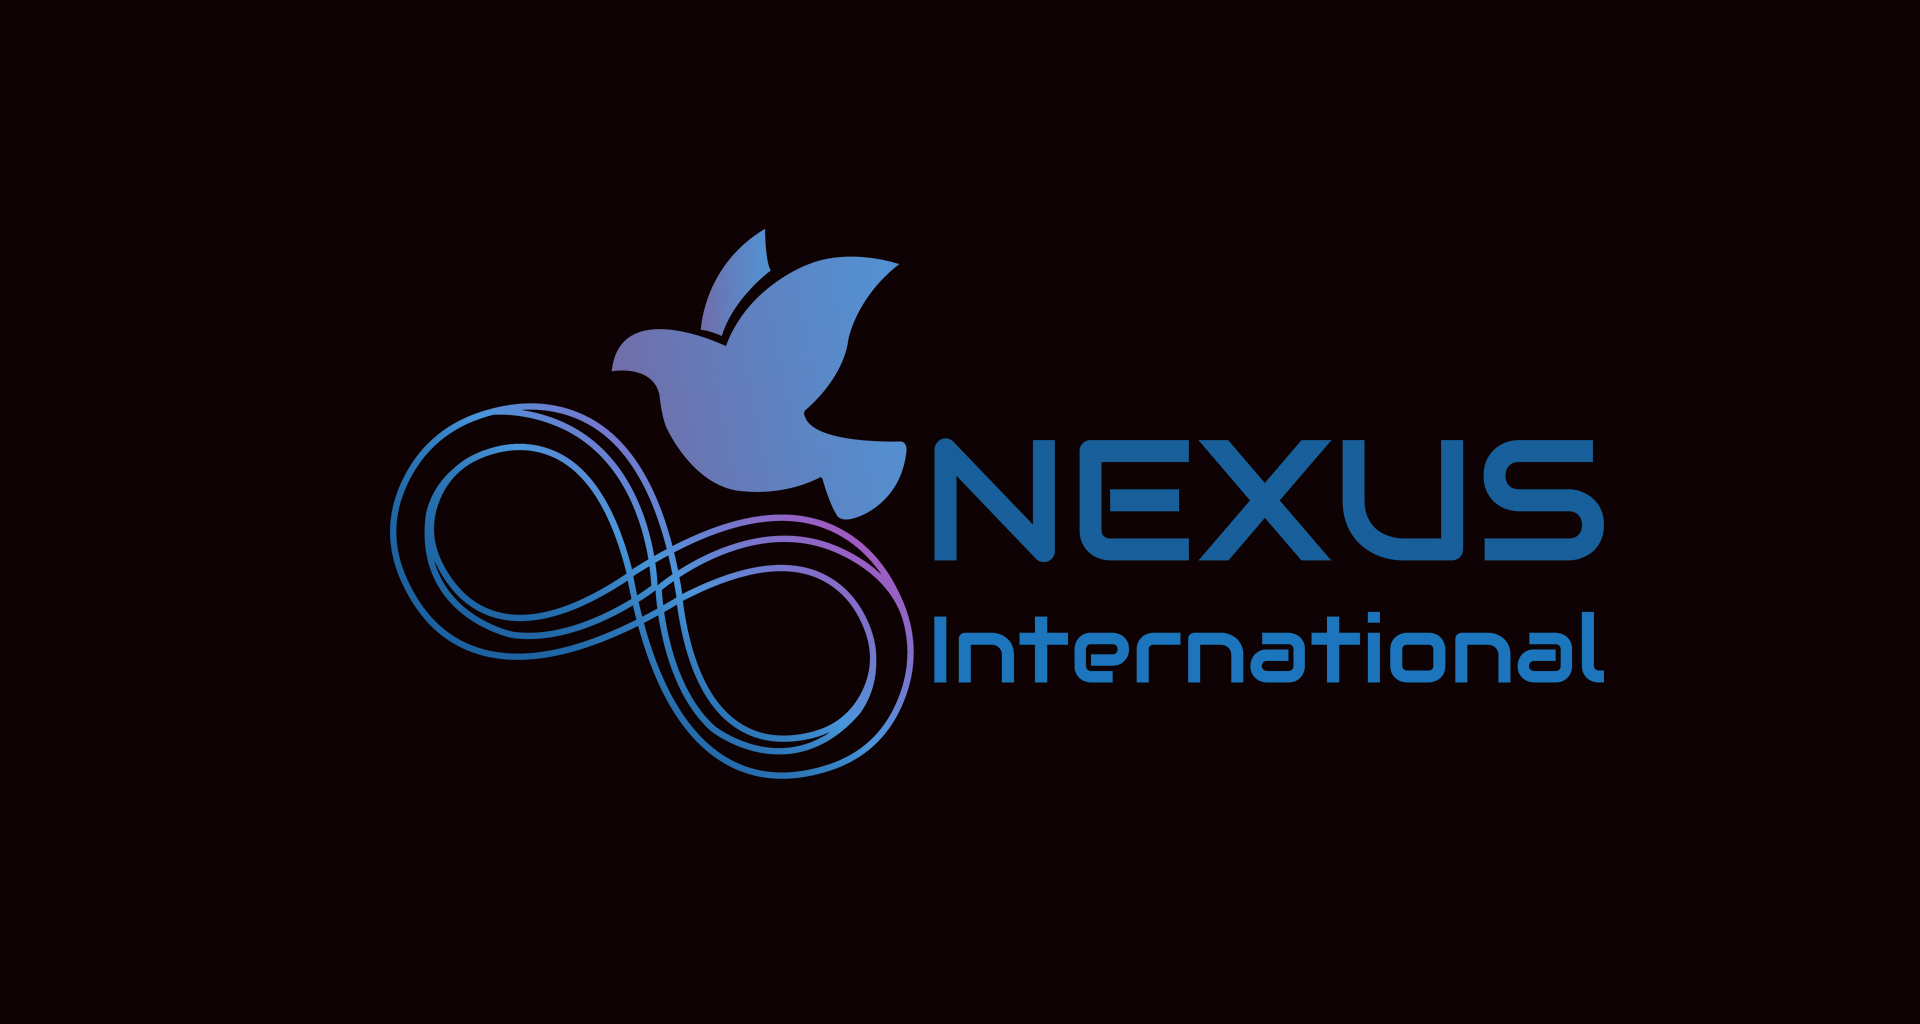 NEXUS International